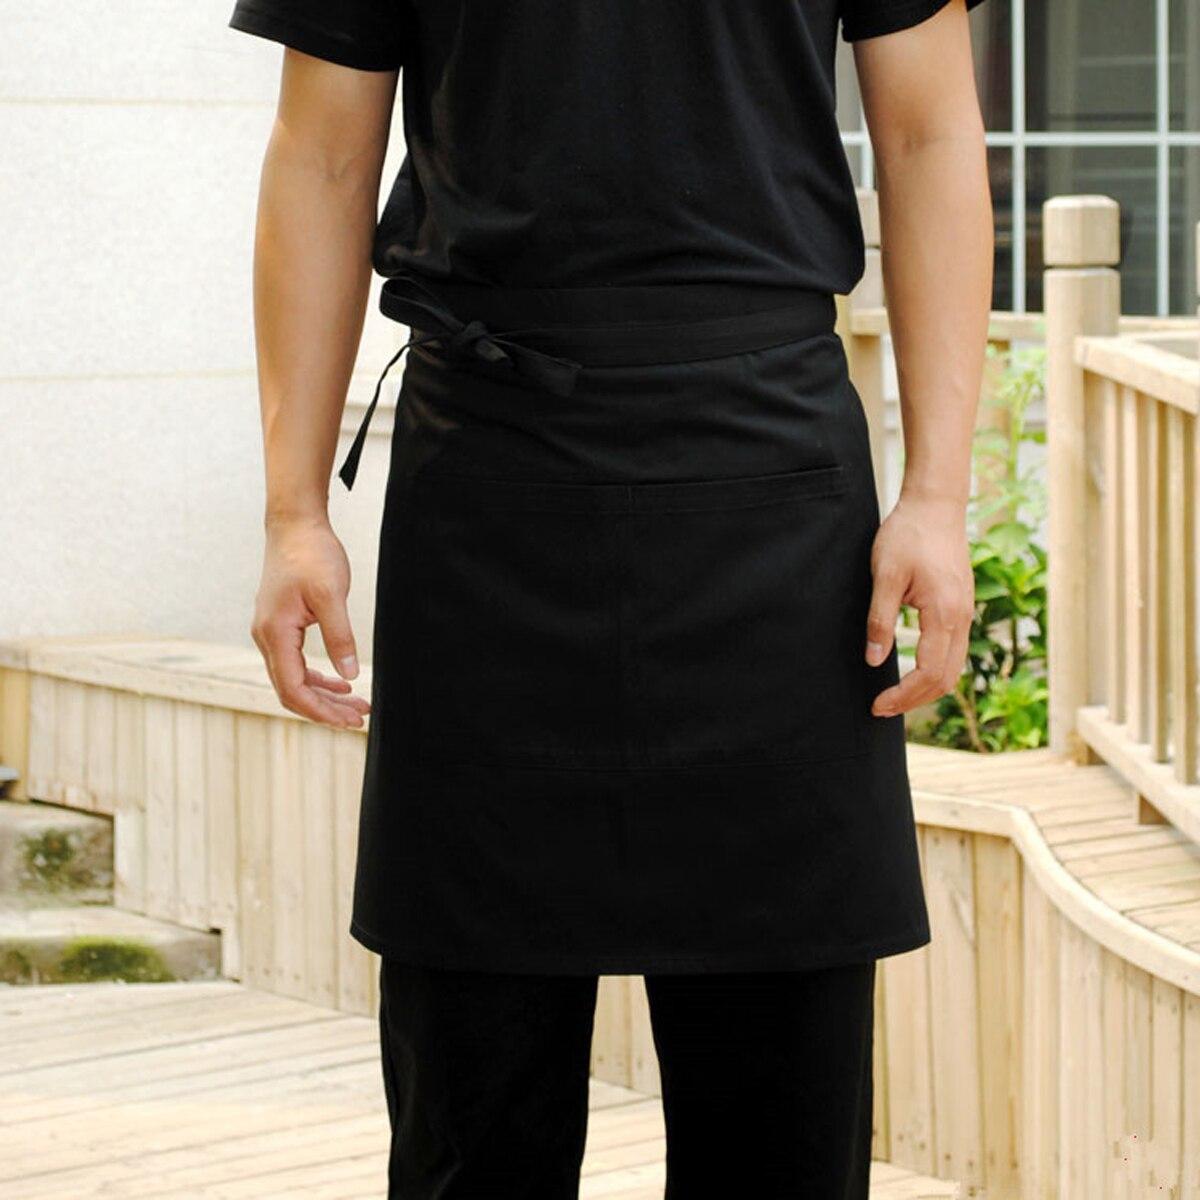 White half apron australia - Universal Unisex Women Men Kitchen Cooking Waist Apron Short Apron Waiter Chef Apron With Double